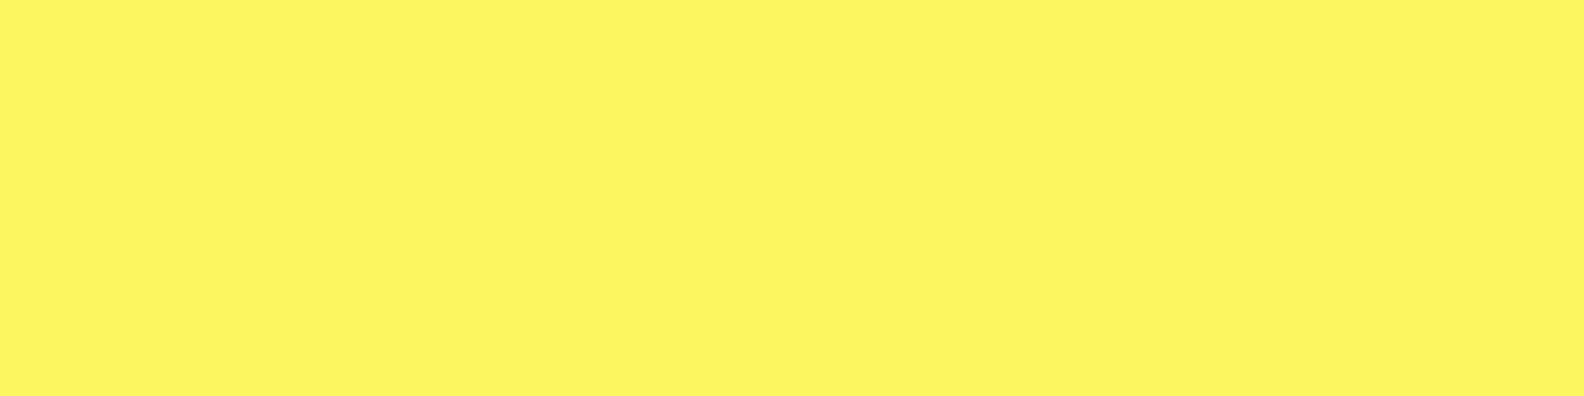 1584x396 Icterine Solid Color Background